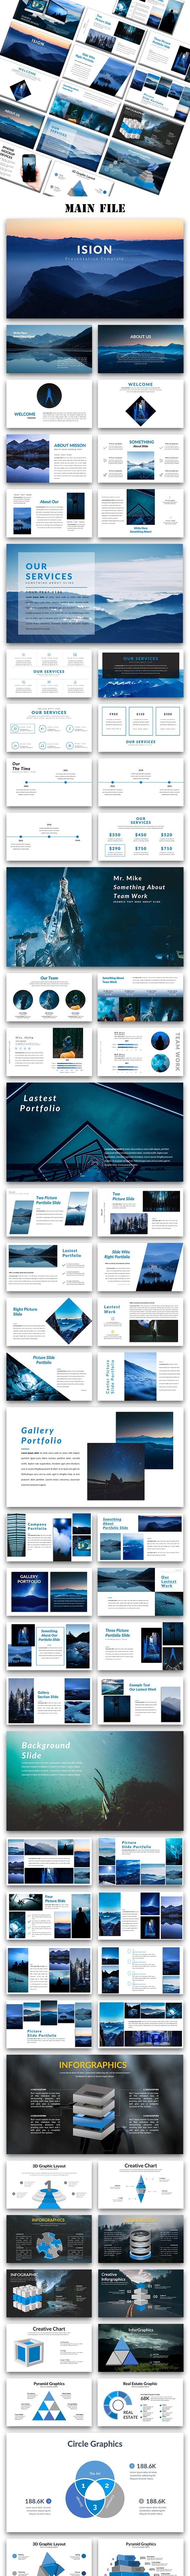 Ision - Creative Google Slide Template - Google Slides Presentation Templates